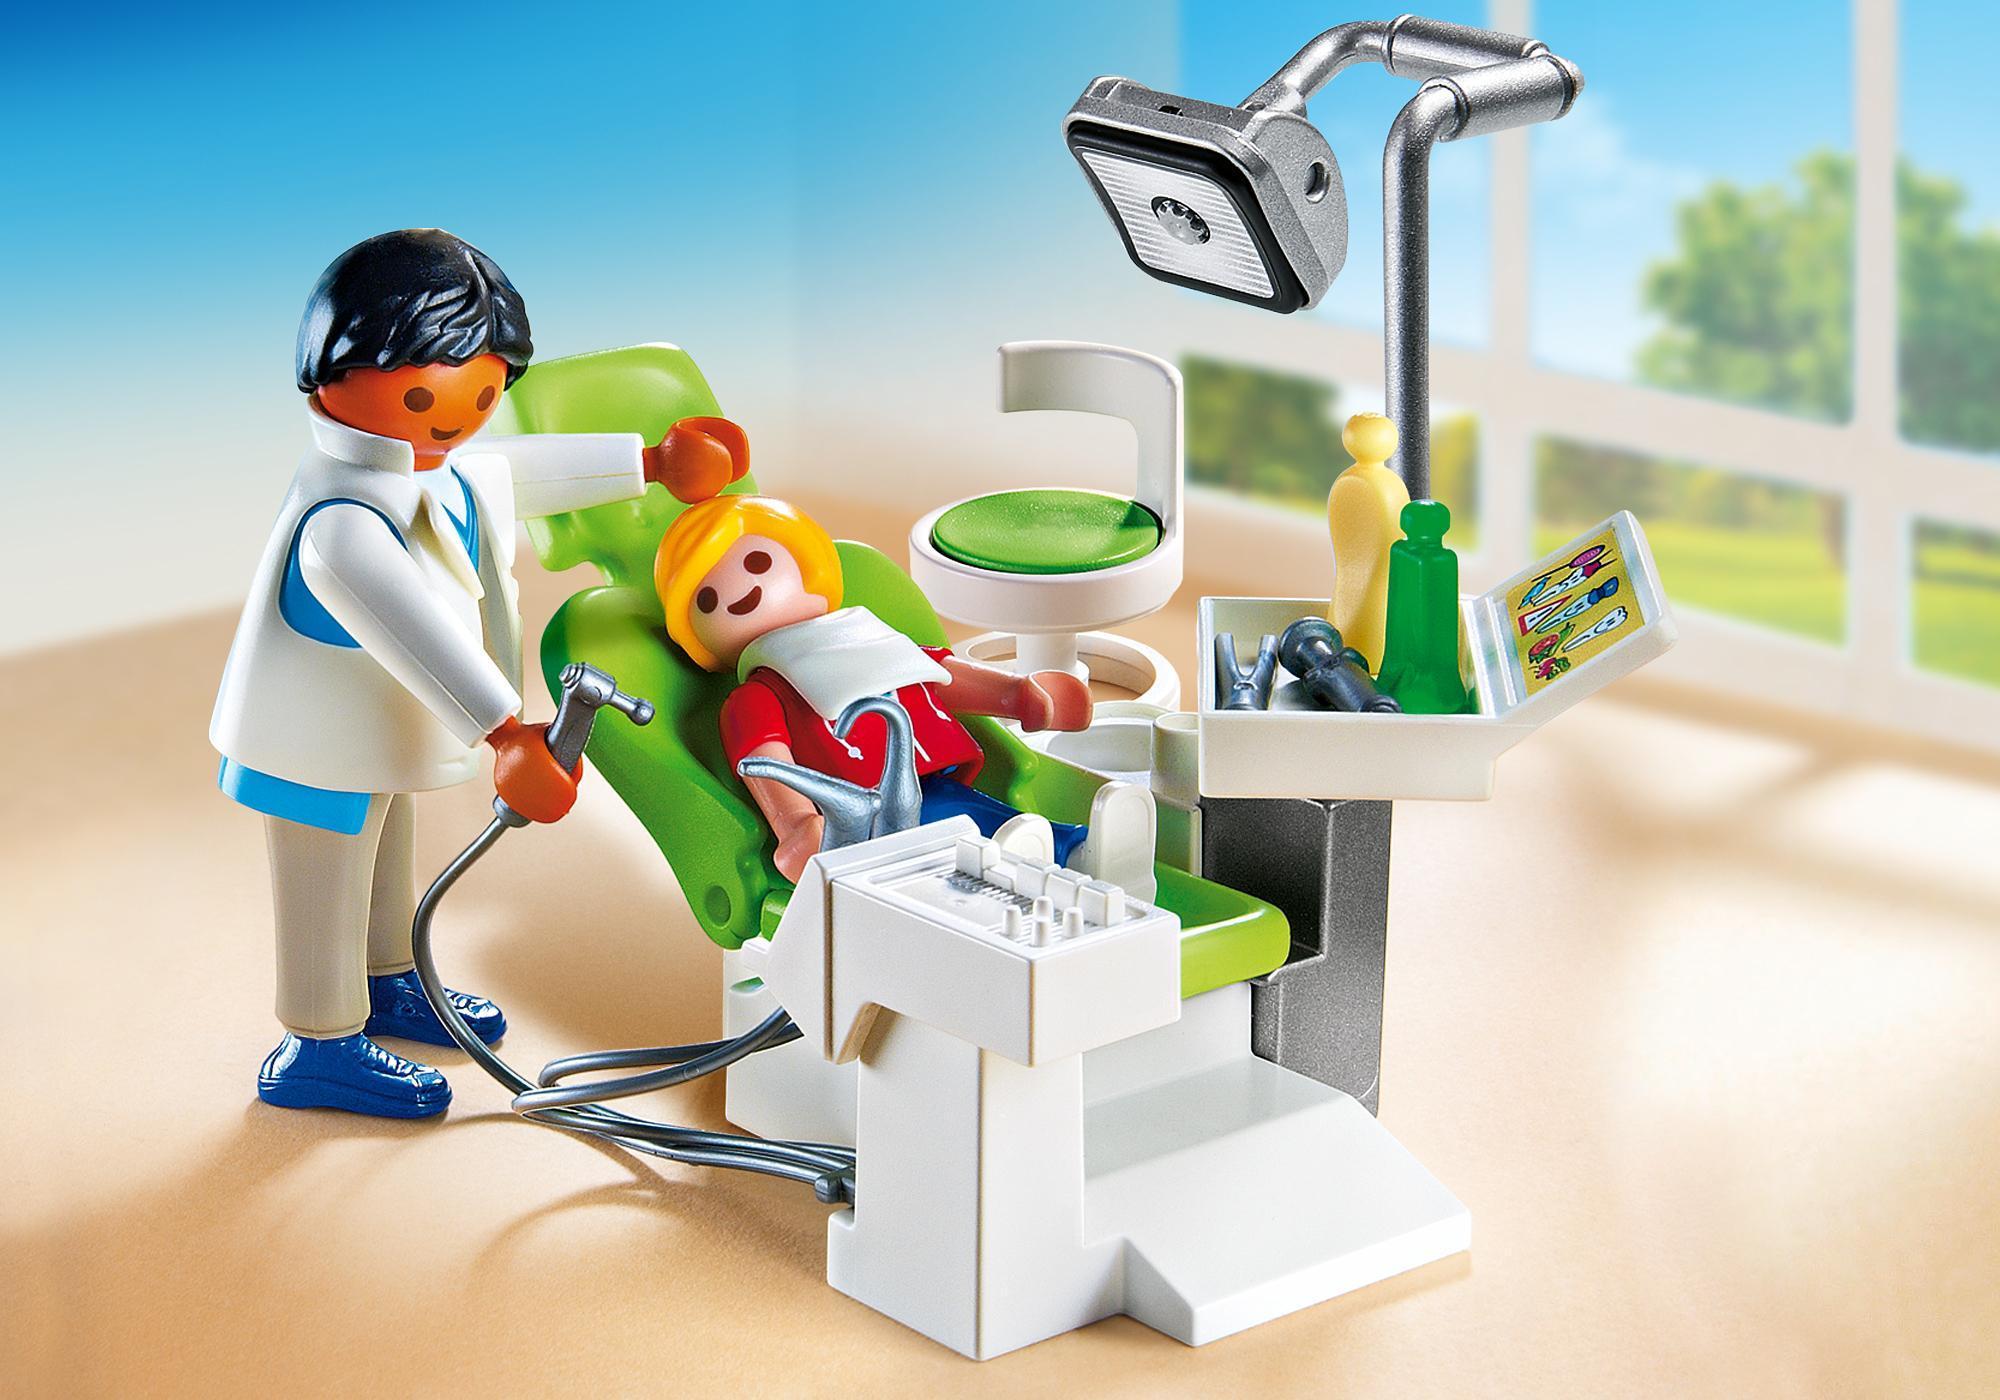 6662_product_detail/Παιδοδοντίατρος με παιδάκι